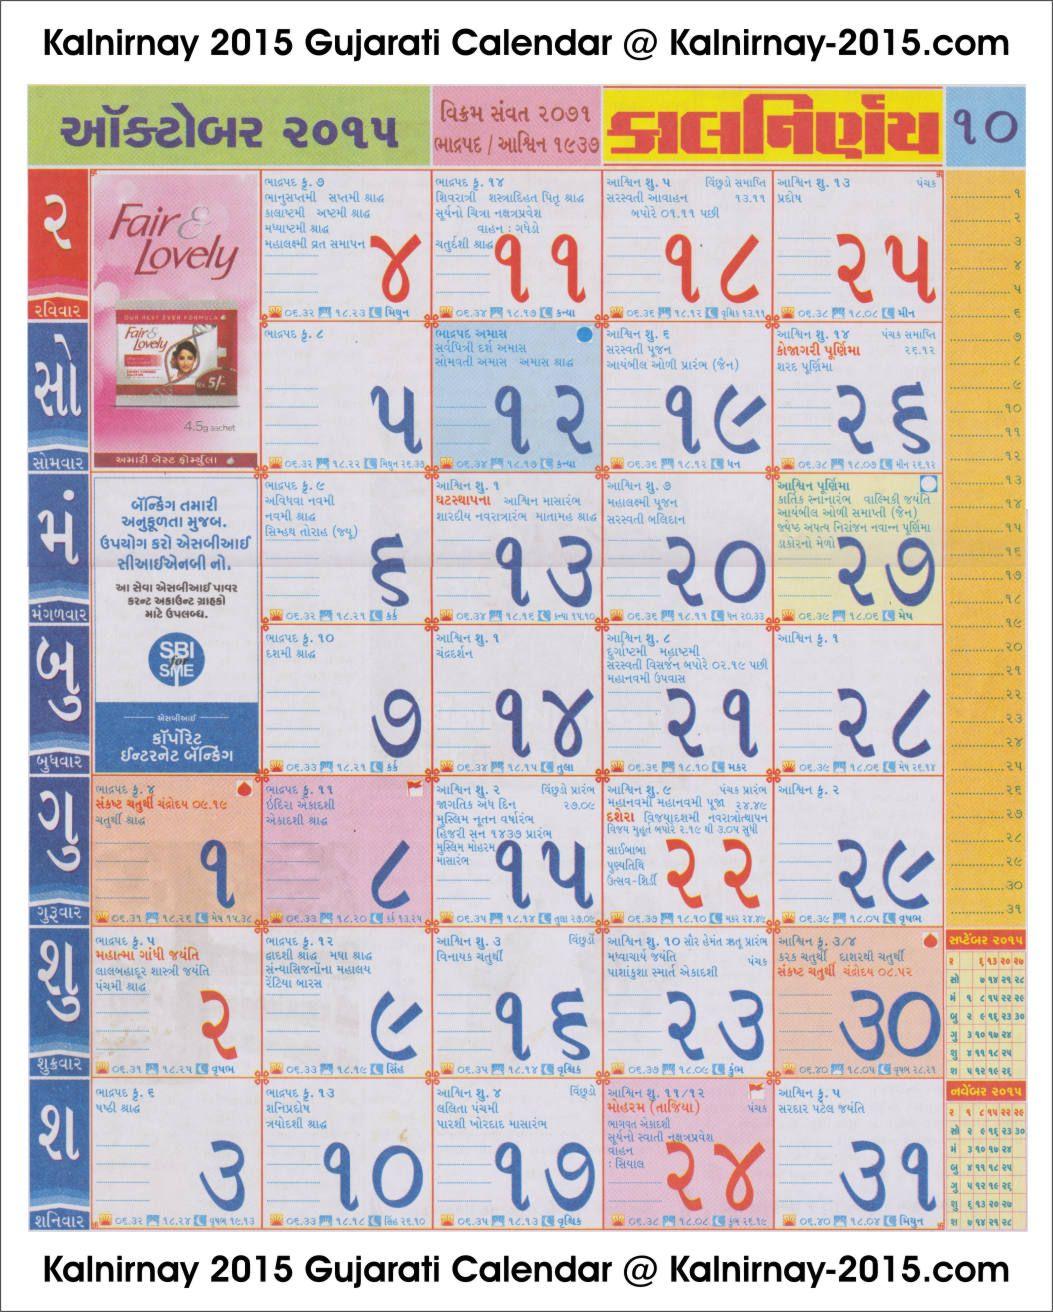 October 2015 Gujarati Kalnirnay Calendar Calendar Calendar